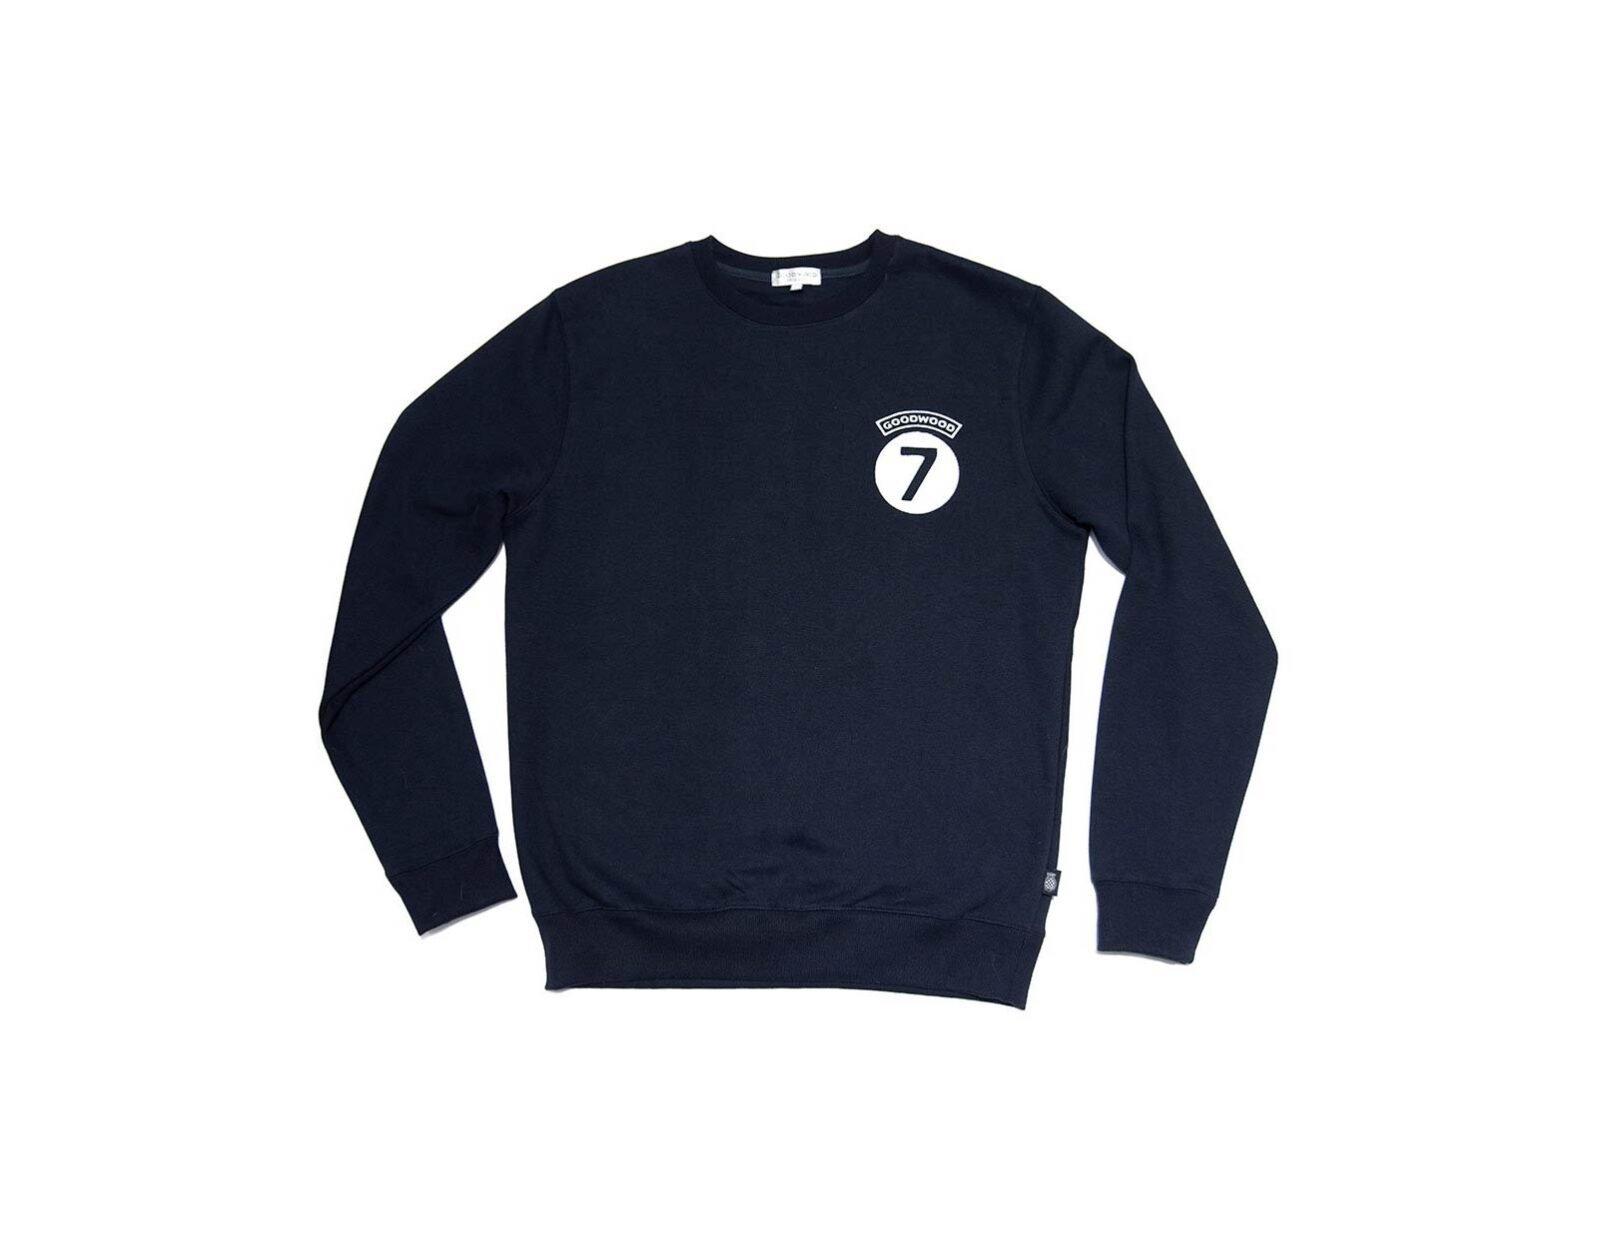 Stirling Moss No. 7 Sweatshirt Goodwood